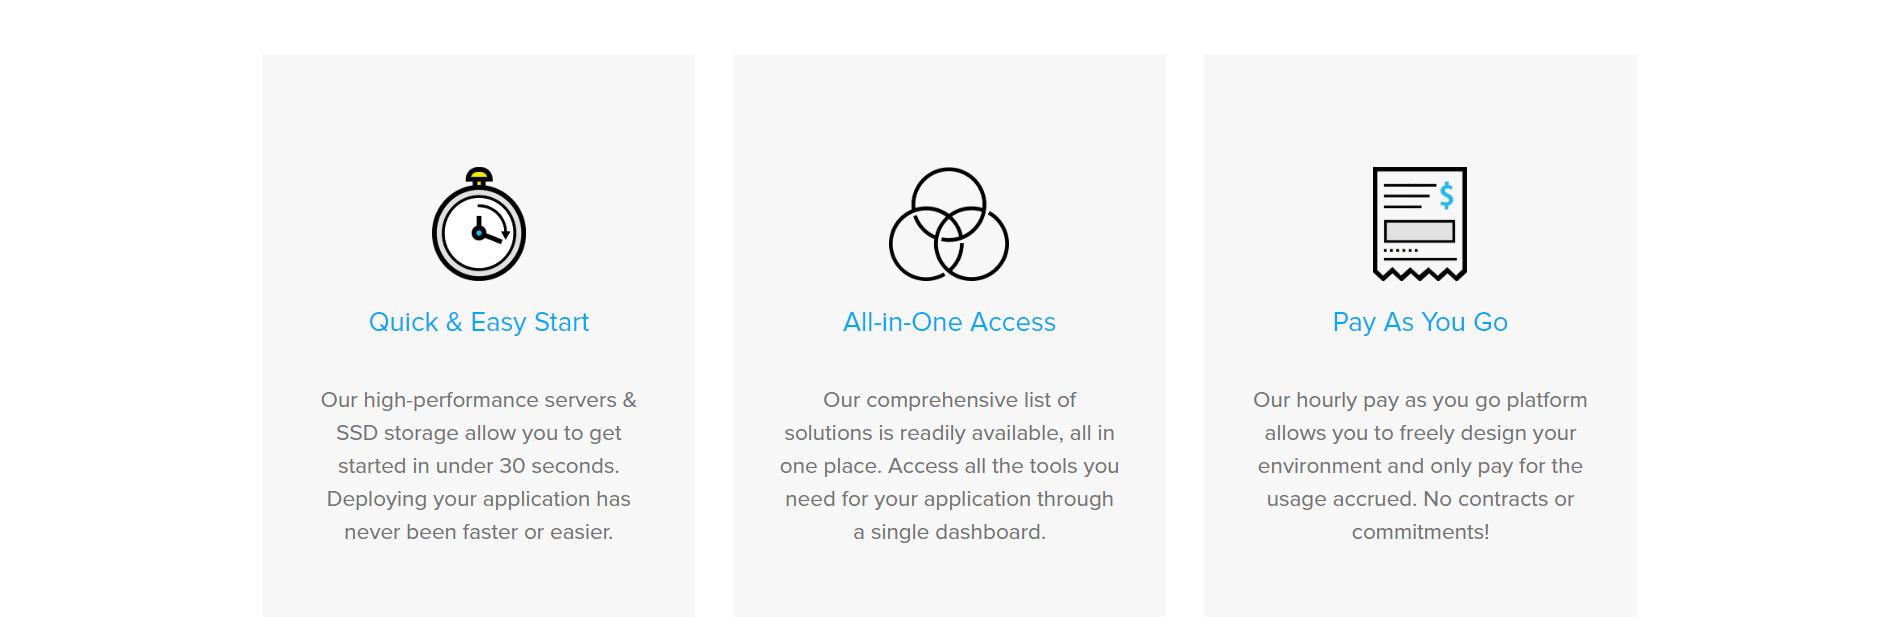 vexxhost-features